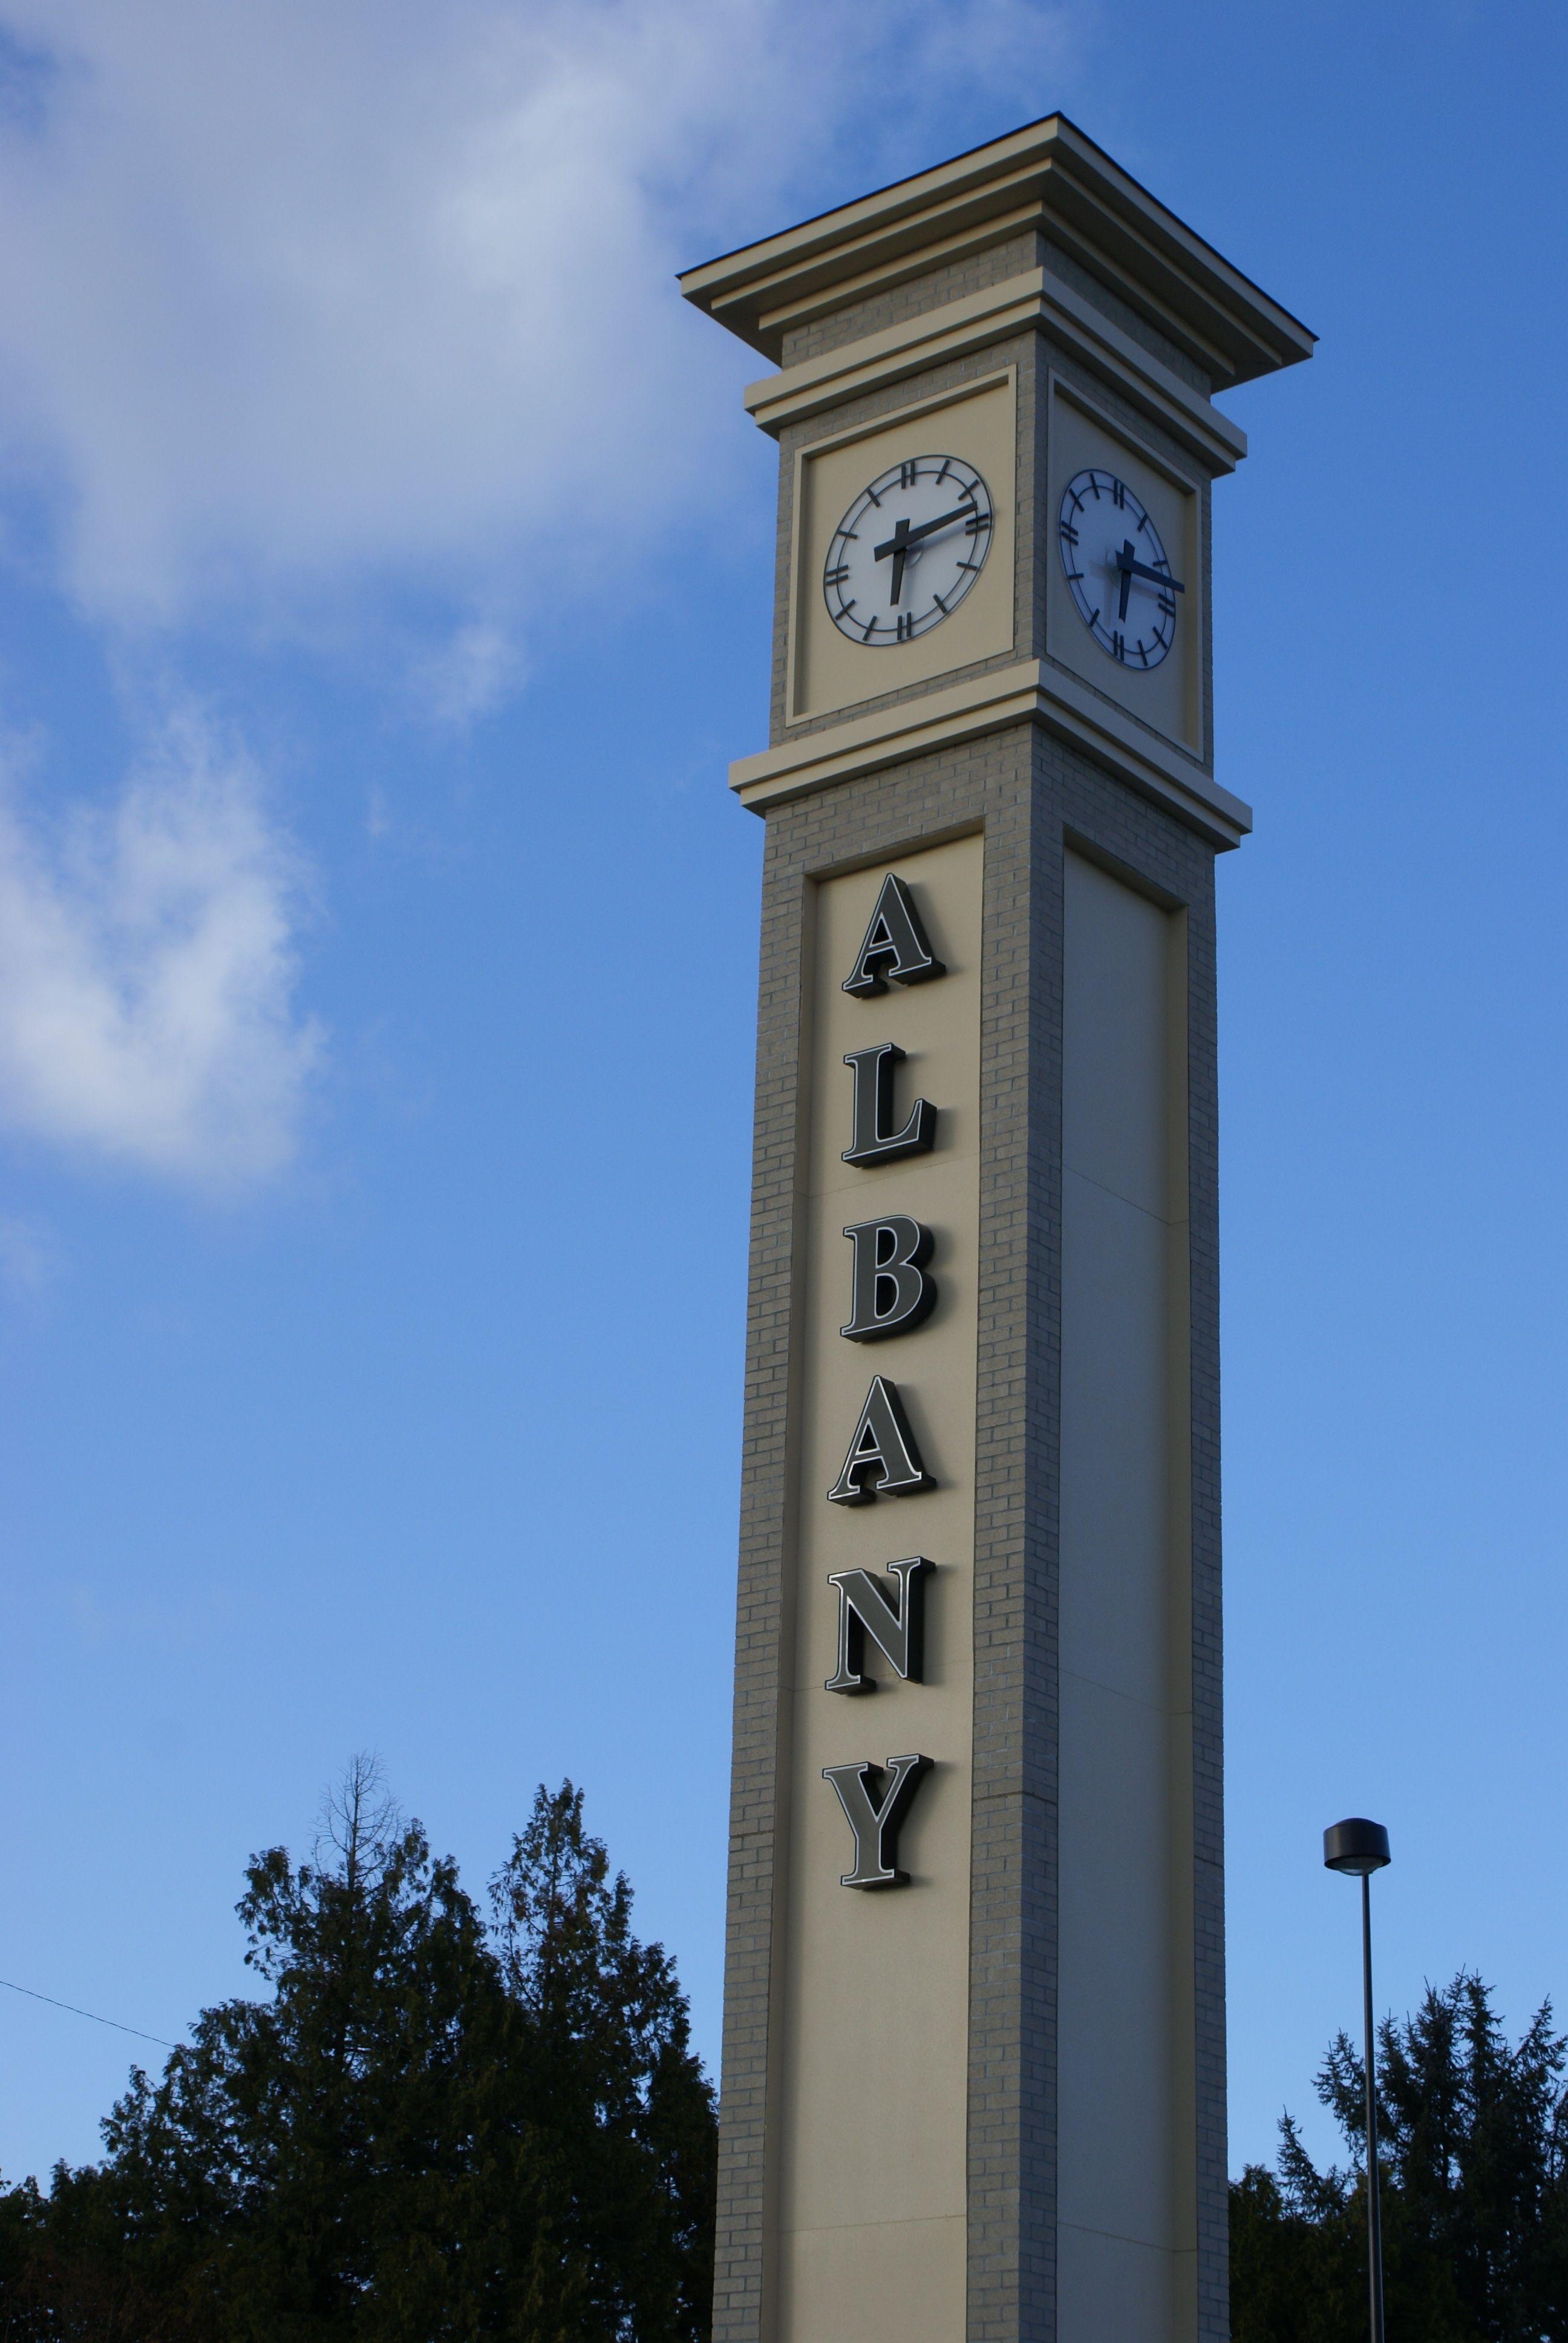 Albany oregons beautiful historic amtrak station with